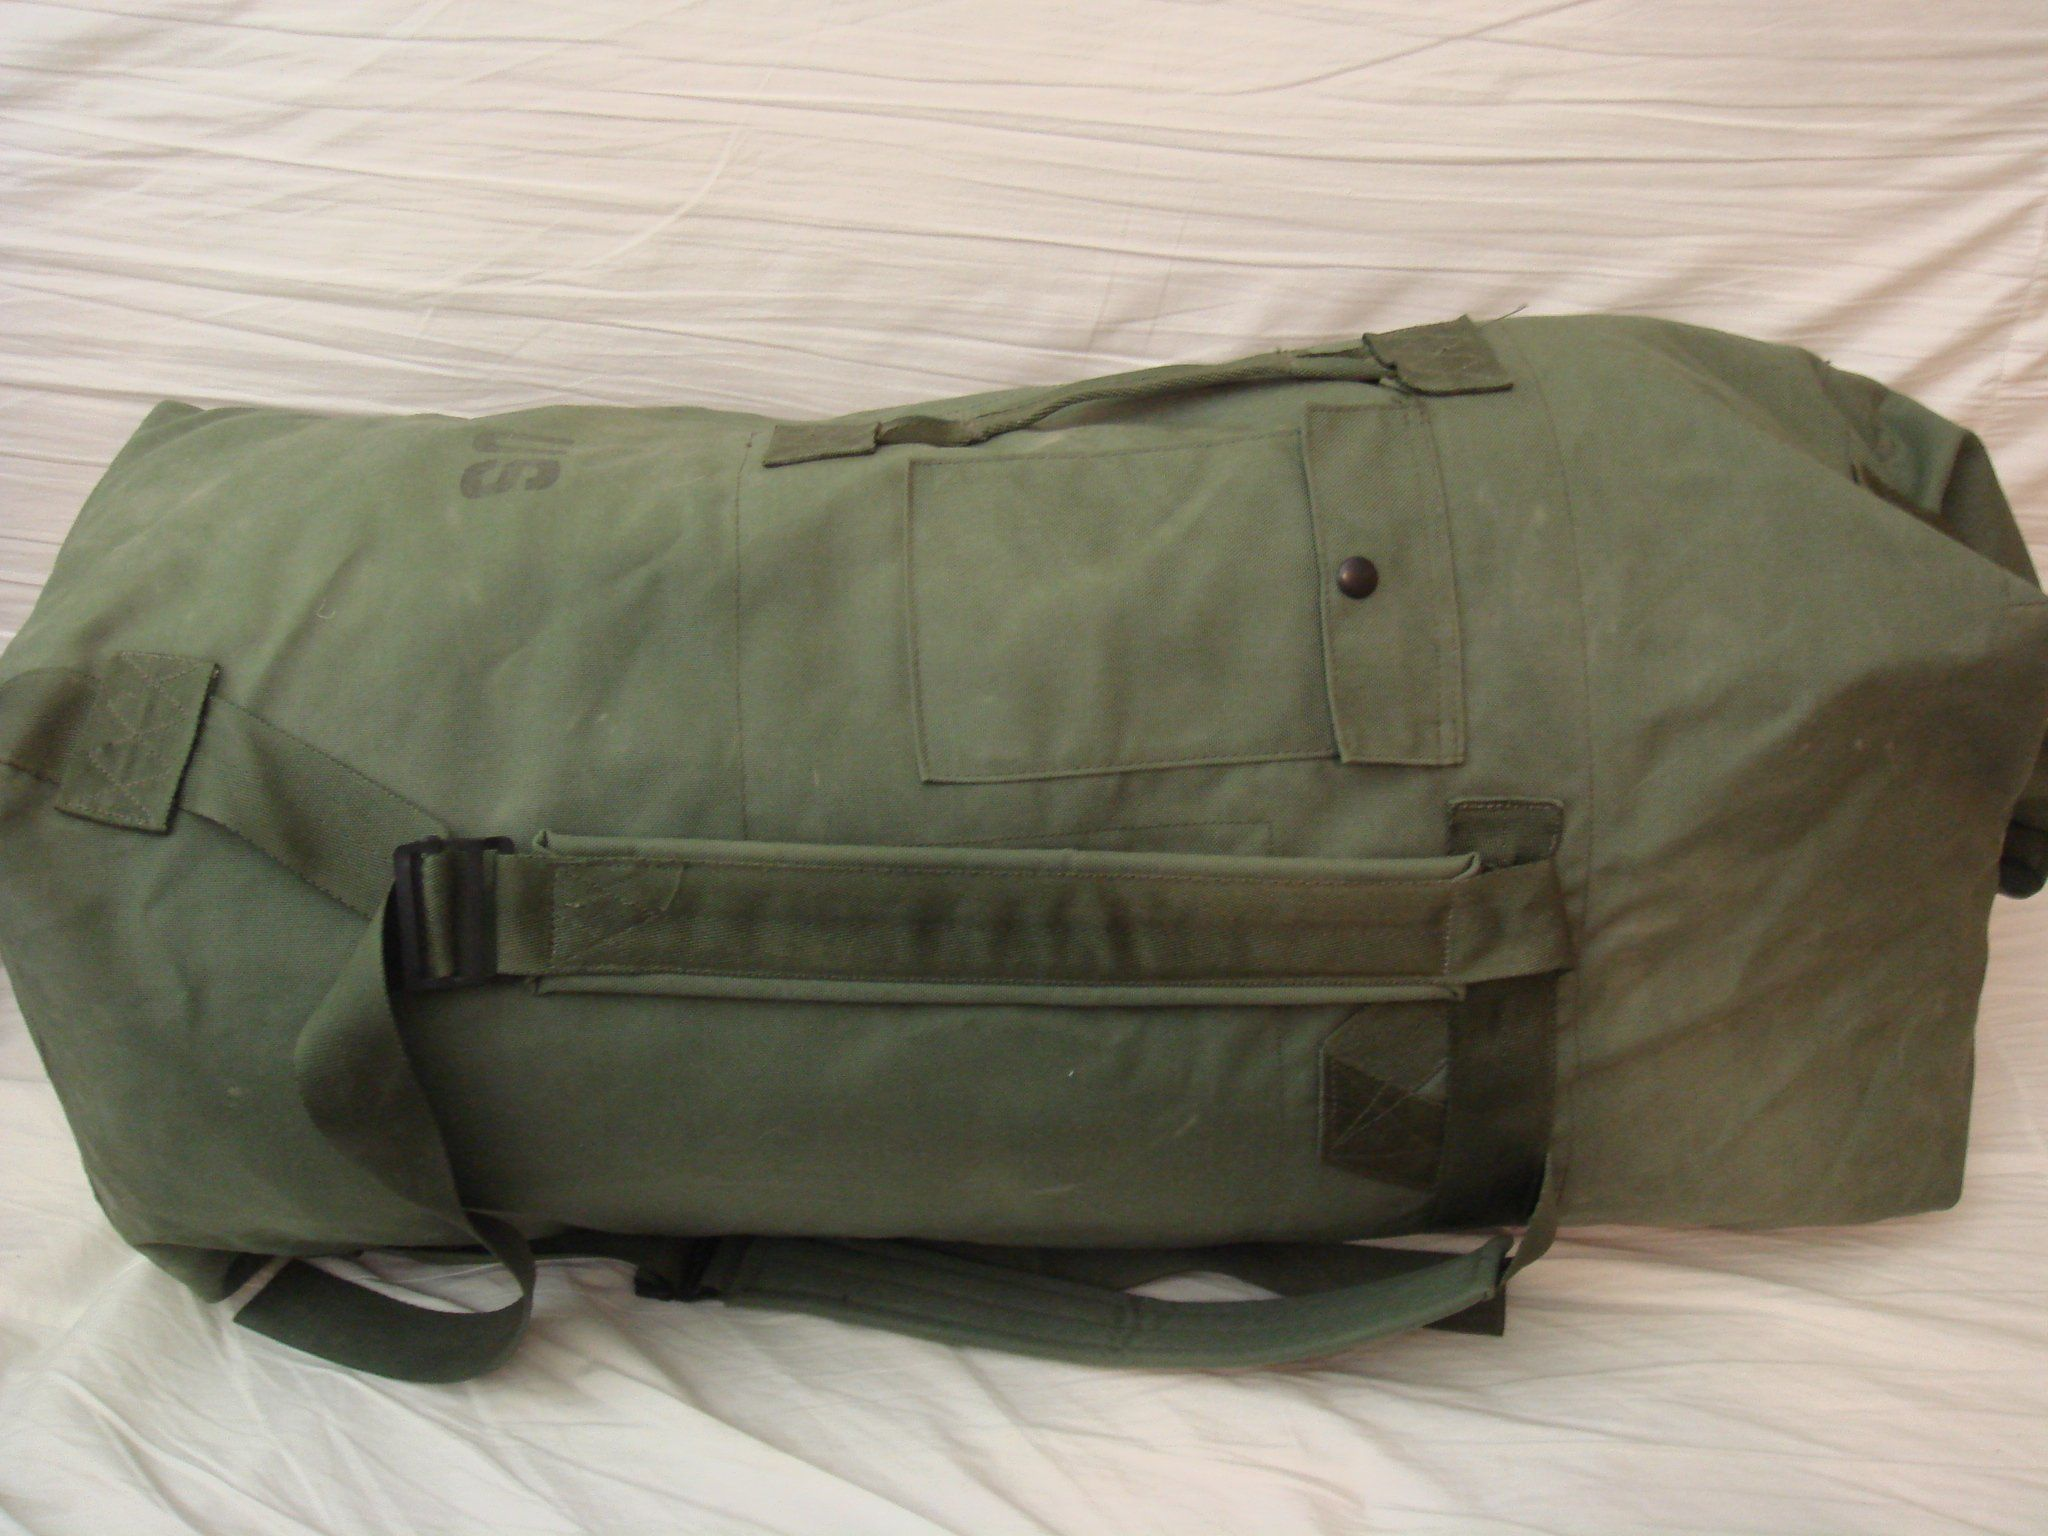 7b7921f052 Official US Military Army Navy Surplus Duffle Duffel Bag